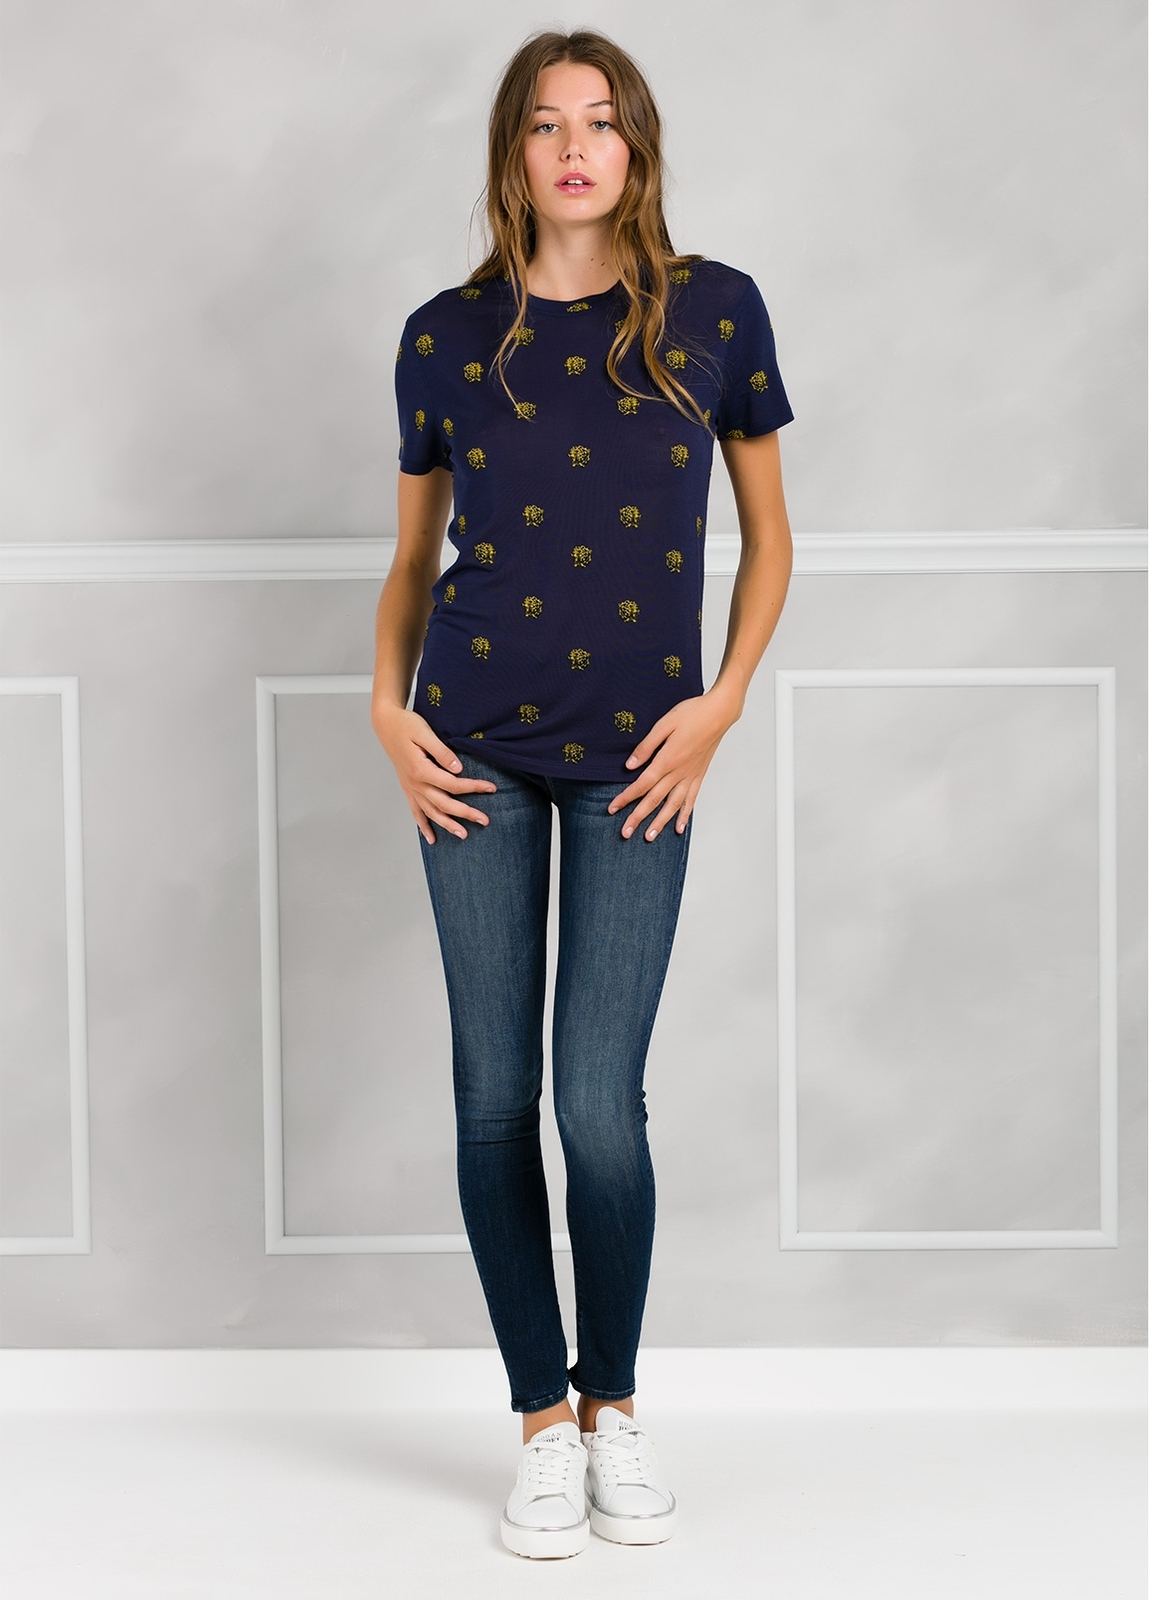 camiseta manga corta color azul marino con dibujo impreso leopardos. 94% Lyocell 6% Elastán.